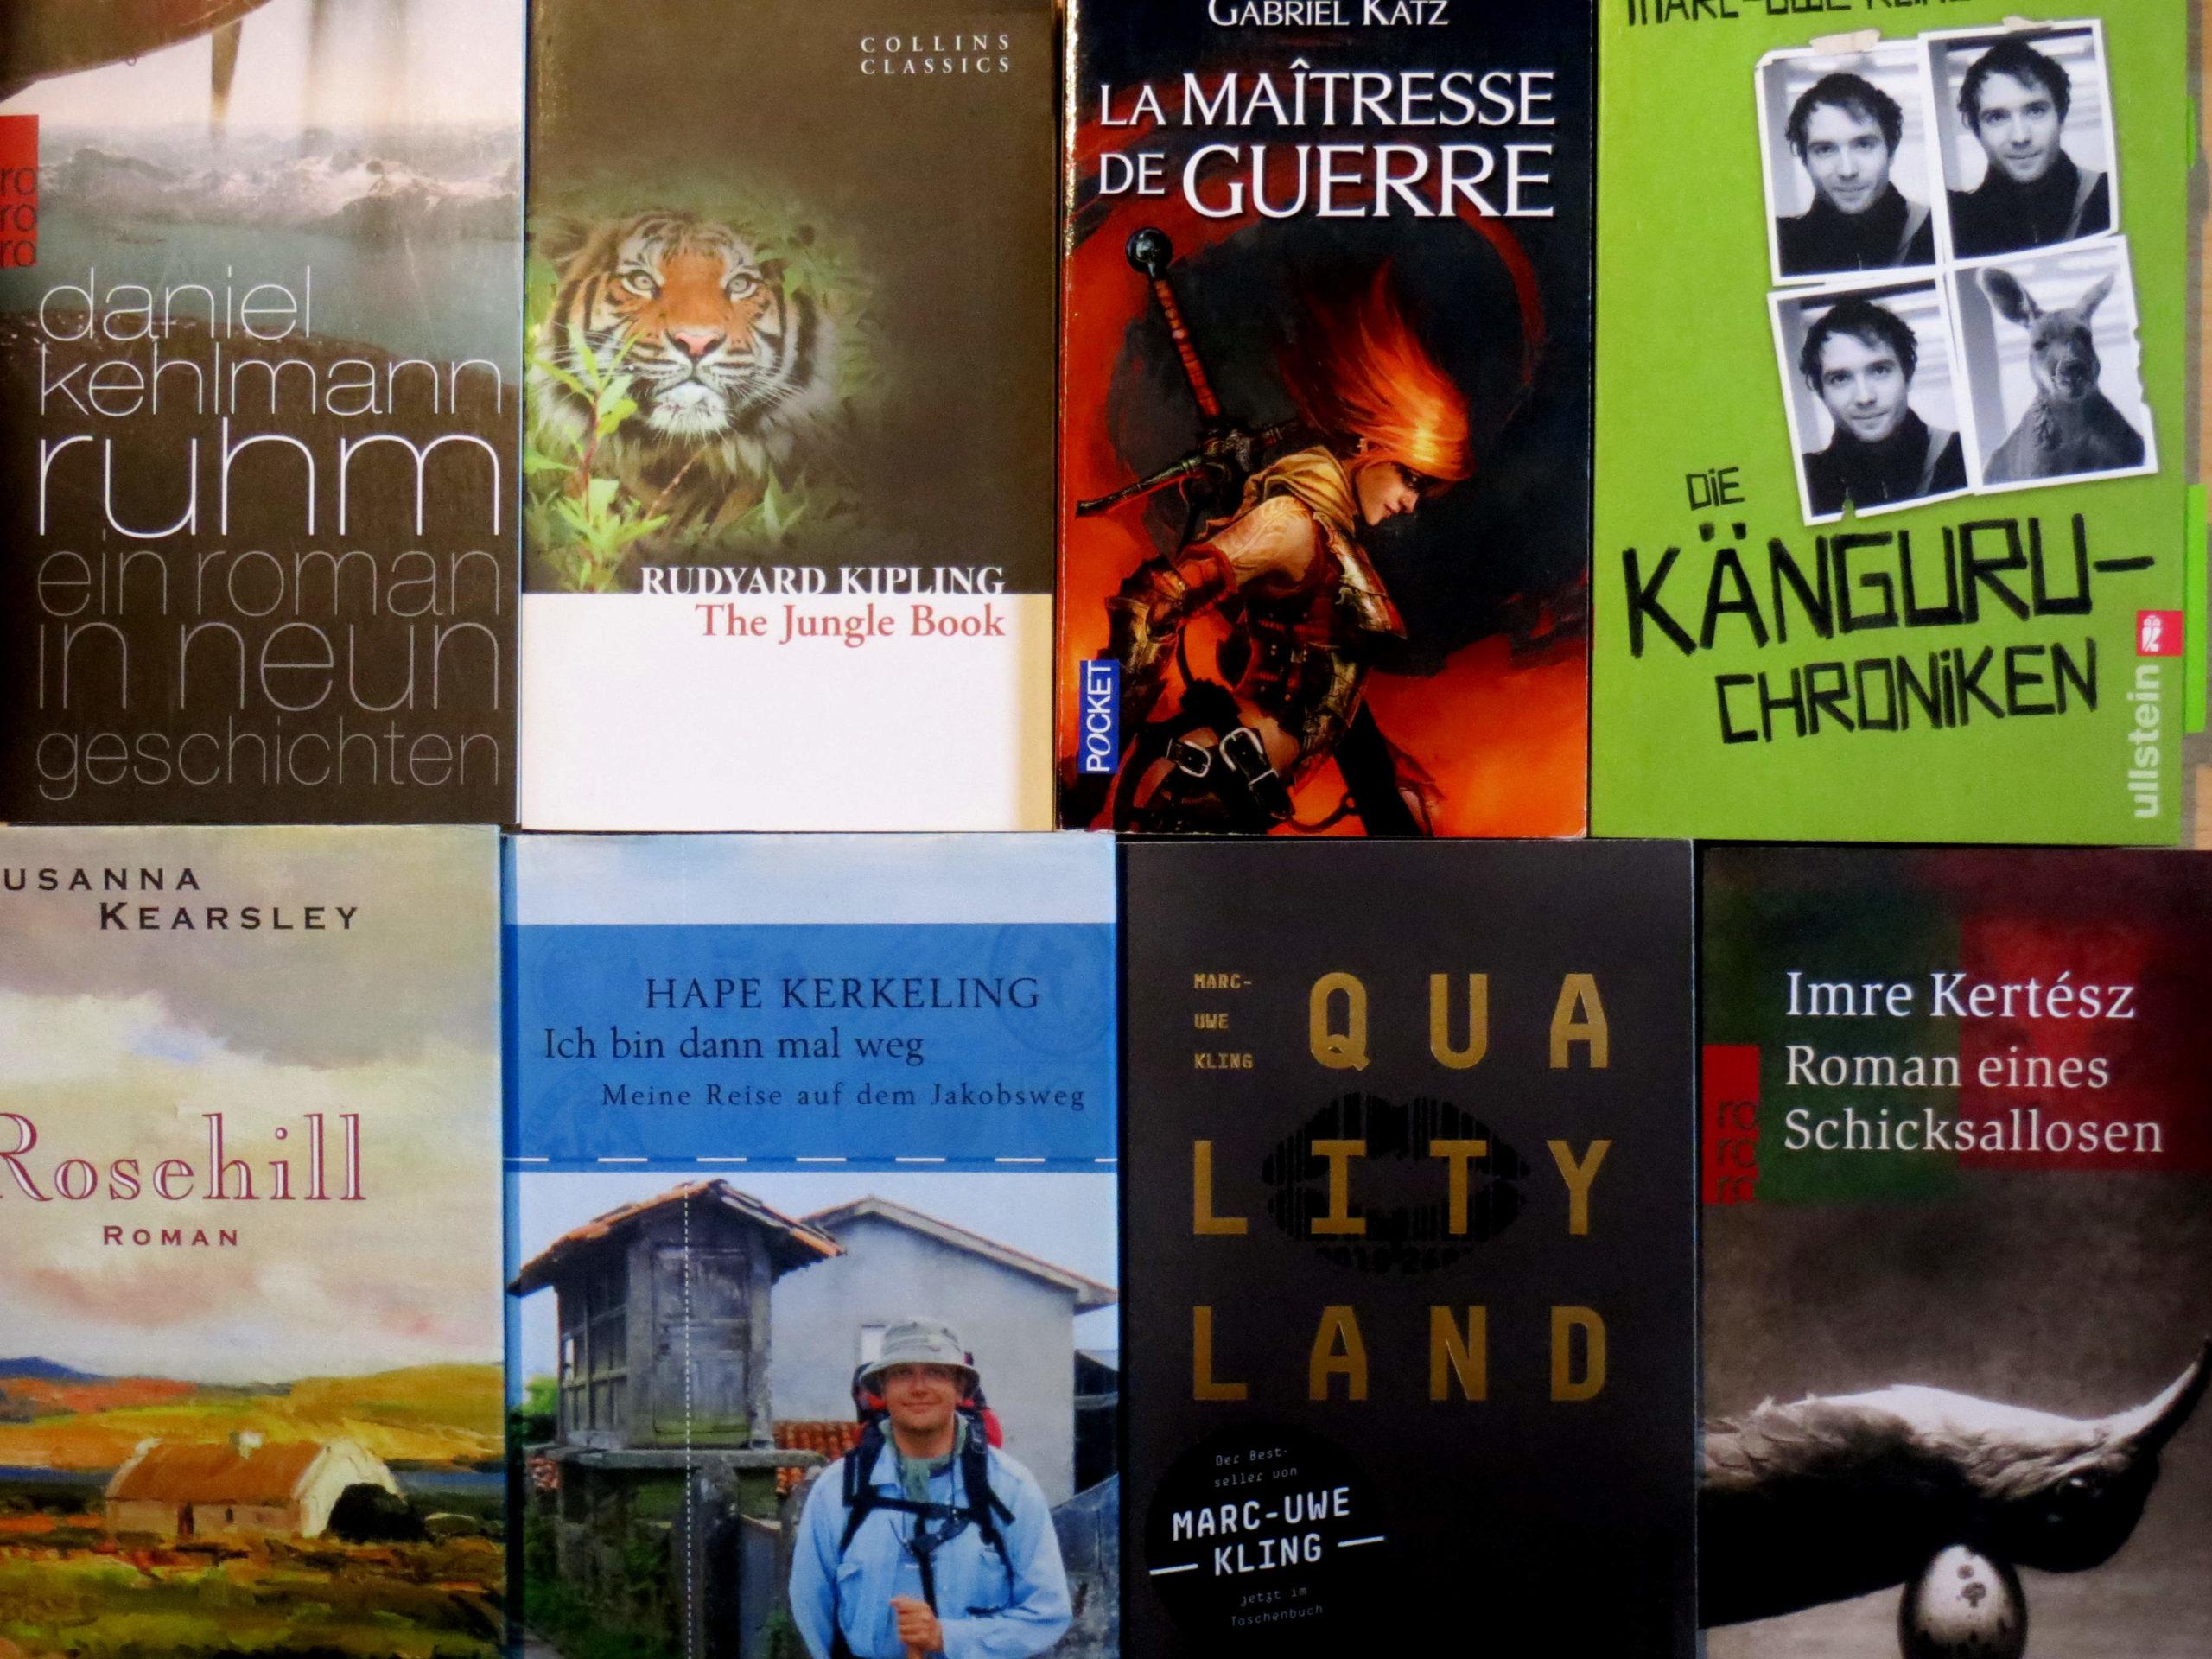 "Daniel Kehlmann ""Ruhm"", Rudyard Kipling ""The Jungle Book"", Gabriel Katz ""La Maîtresse de Guerre"", Marc-Uwe Kling ""Die Känguru-Chroniken"", Susanna Kearsley ""Rosehill"", Hape Kerkeling ""Ich bin dann mal weg"", Marc-Uwe Kling ""QualityLand"", Imre Kertész ""Roman eines Schicksallosen"""